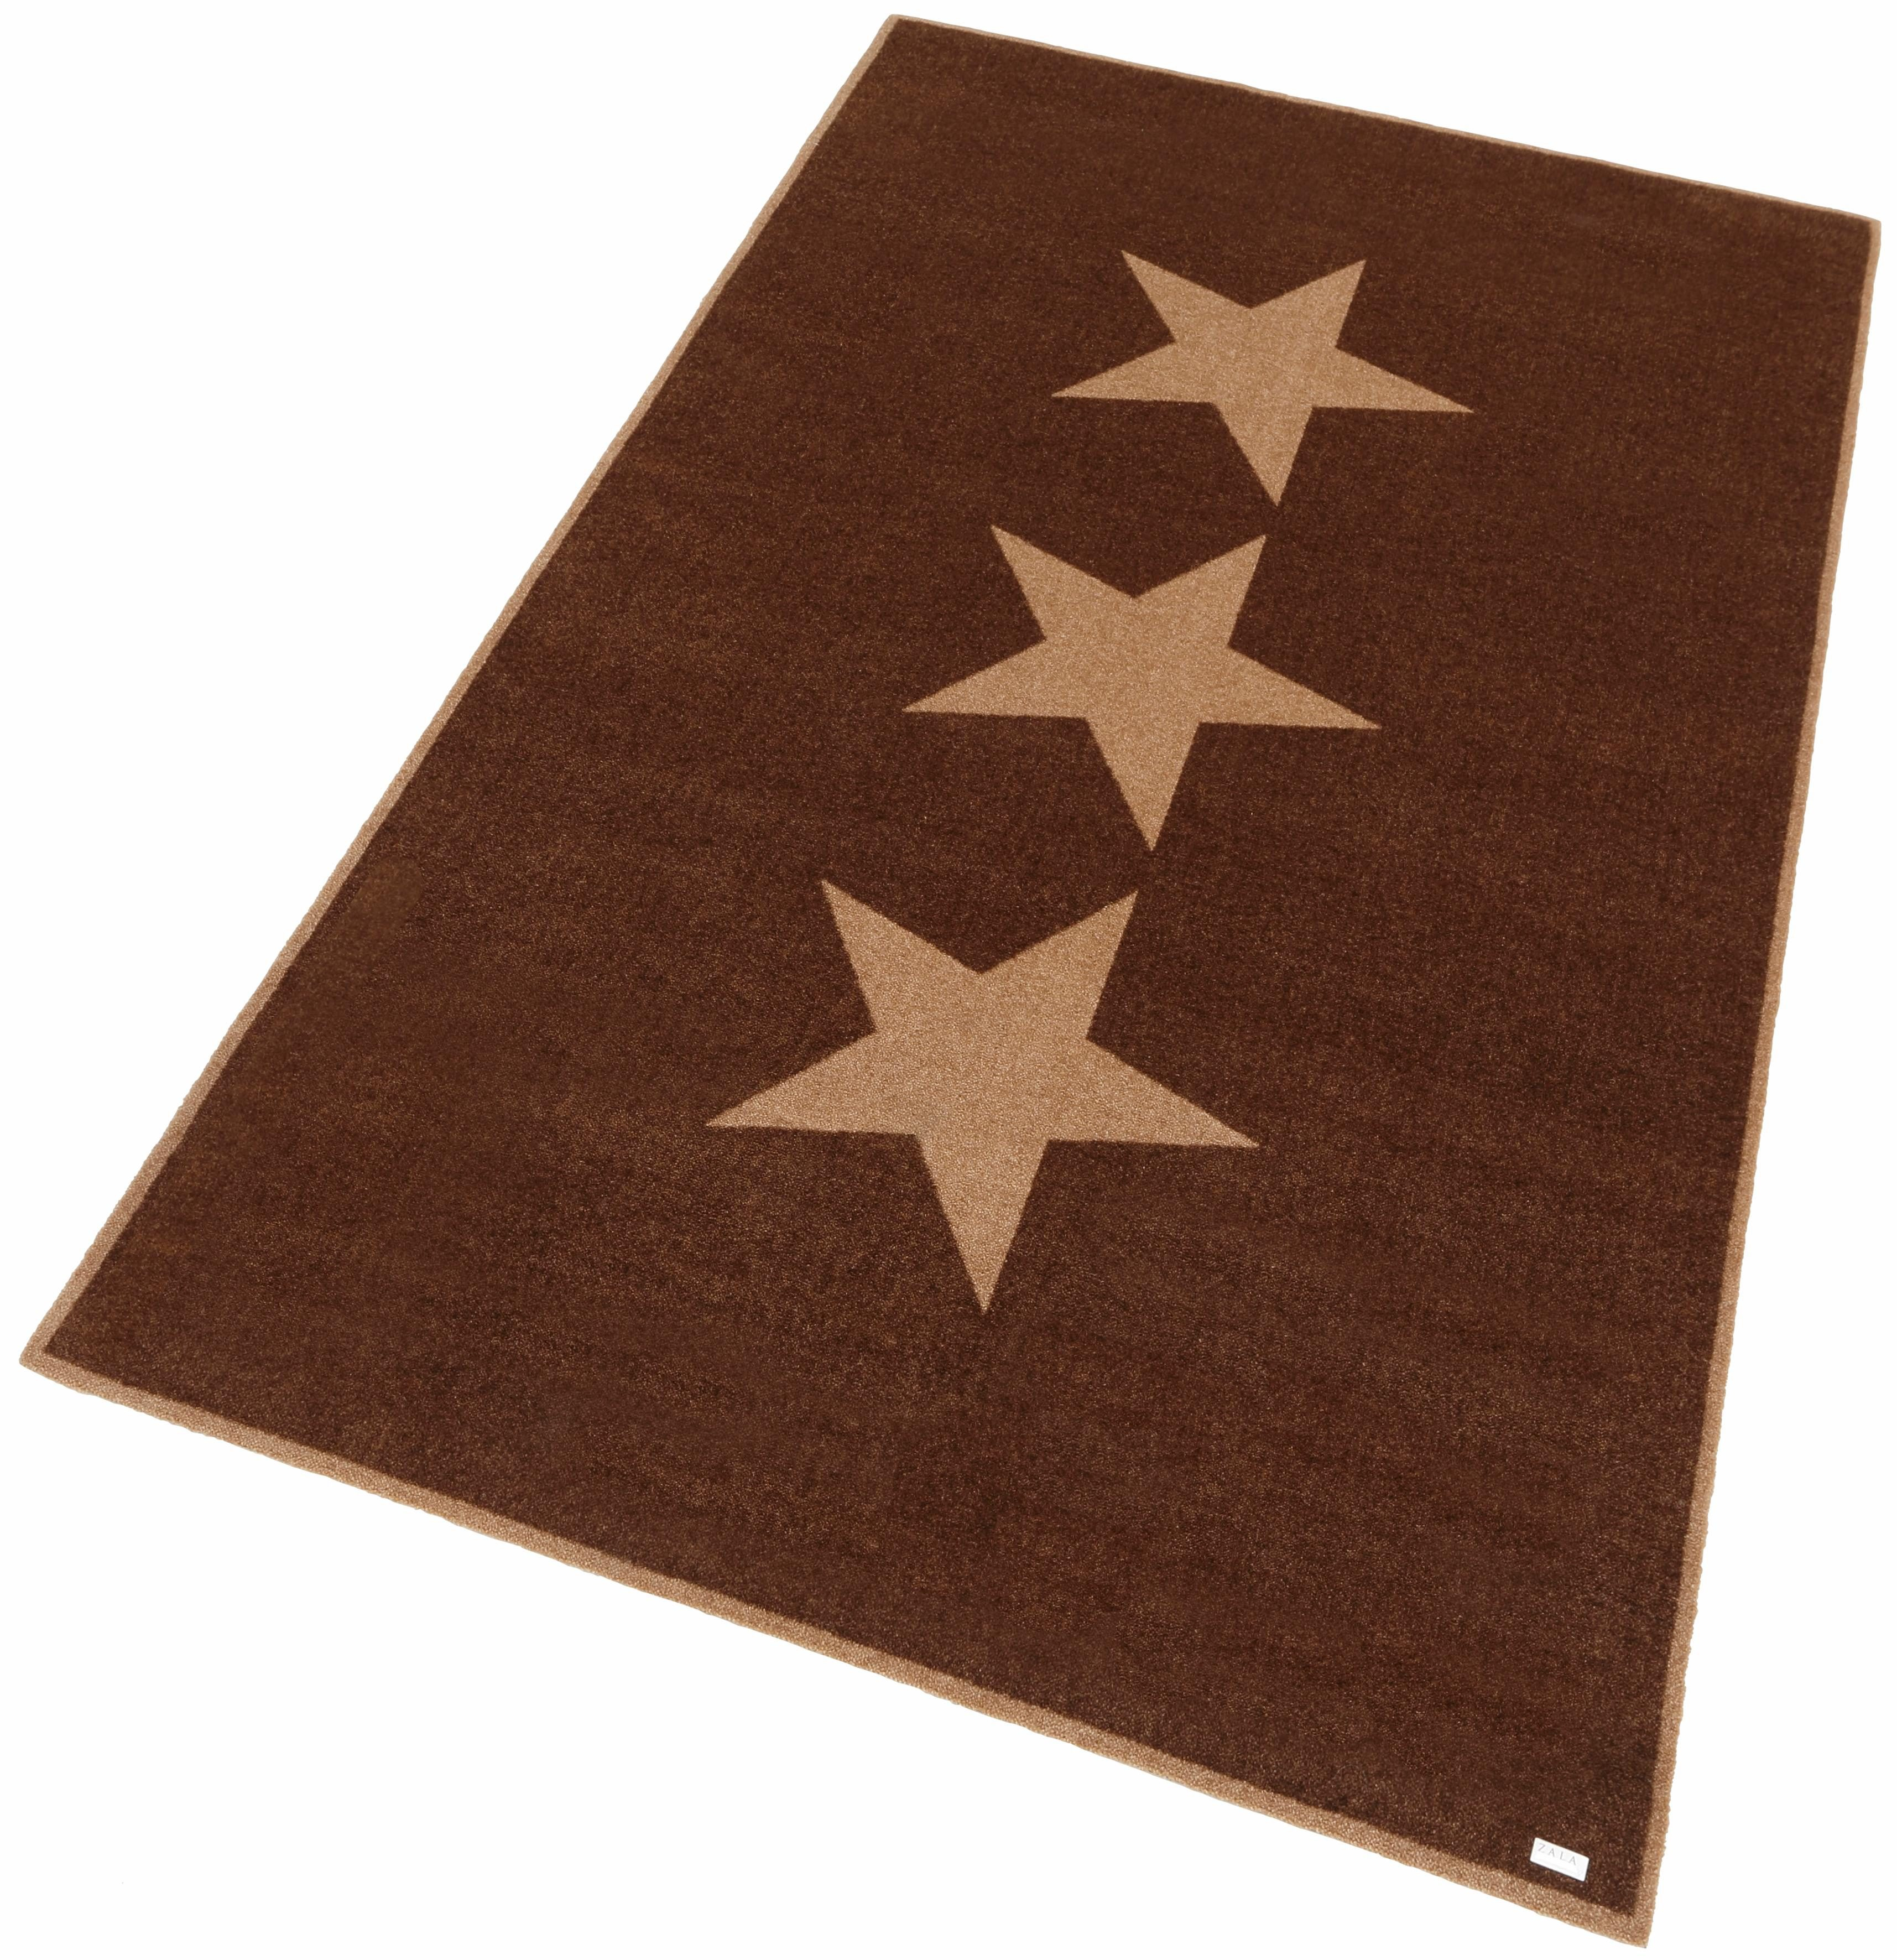 Teppich Sterne Zala Living rechteckig Höhe 7 mm maschinell getuftet